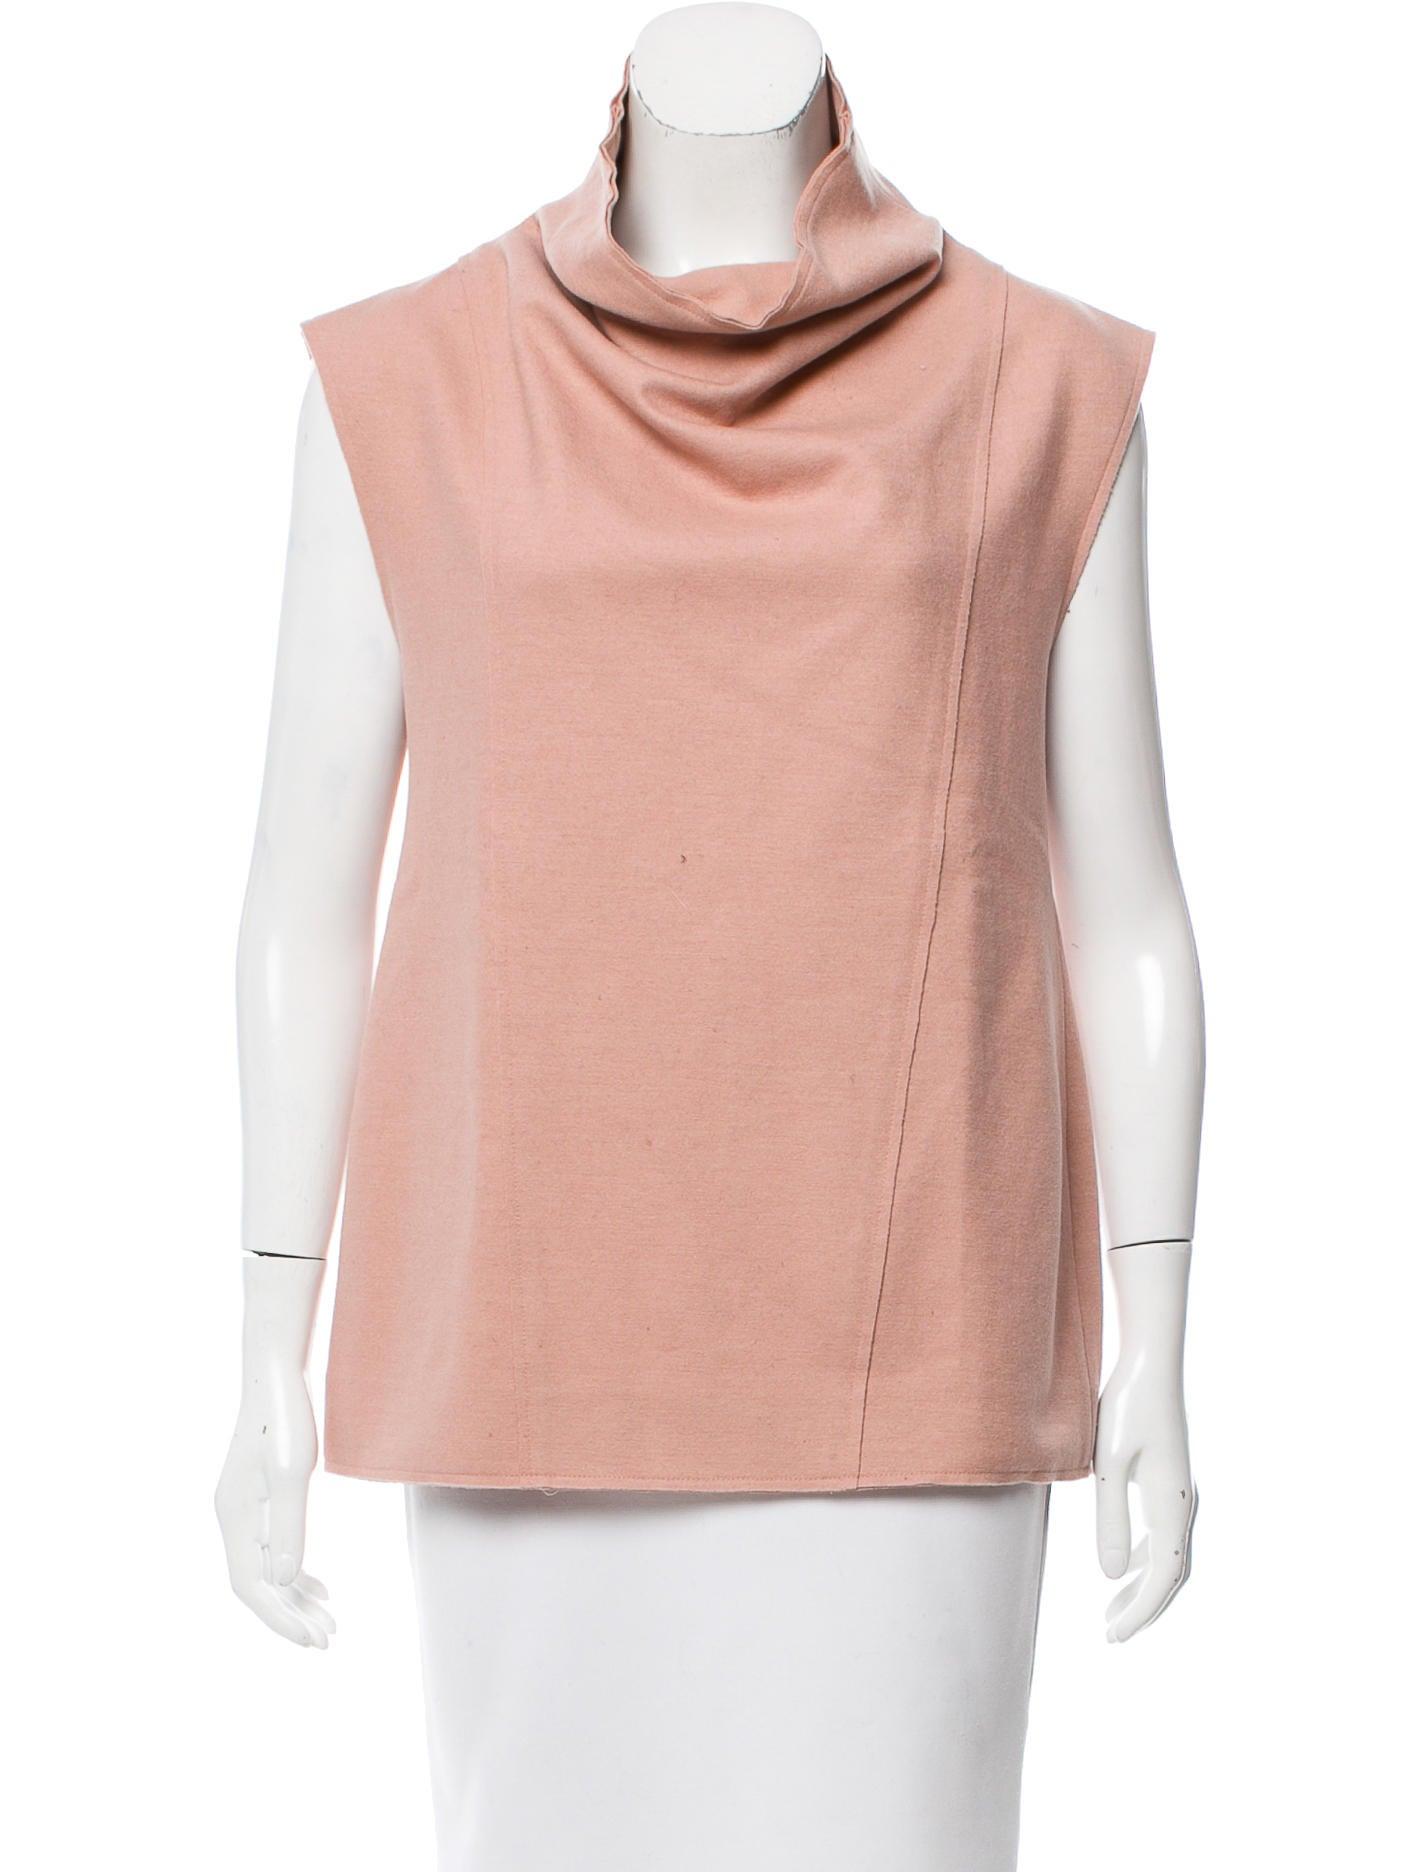 Eron wool sleeveless top clothing waero20026 the for Best wool shirt jackets